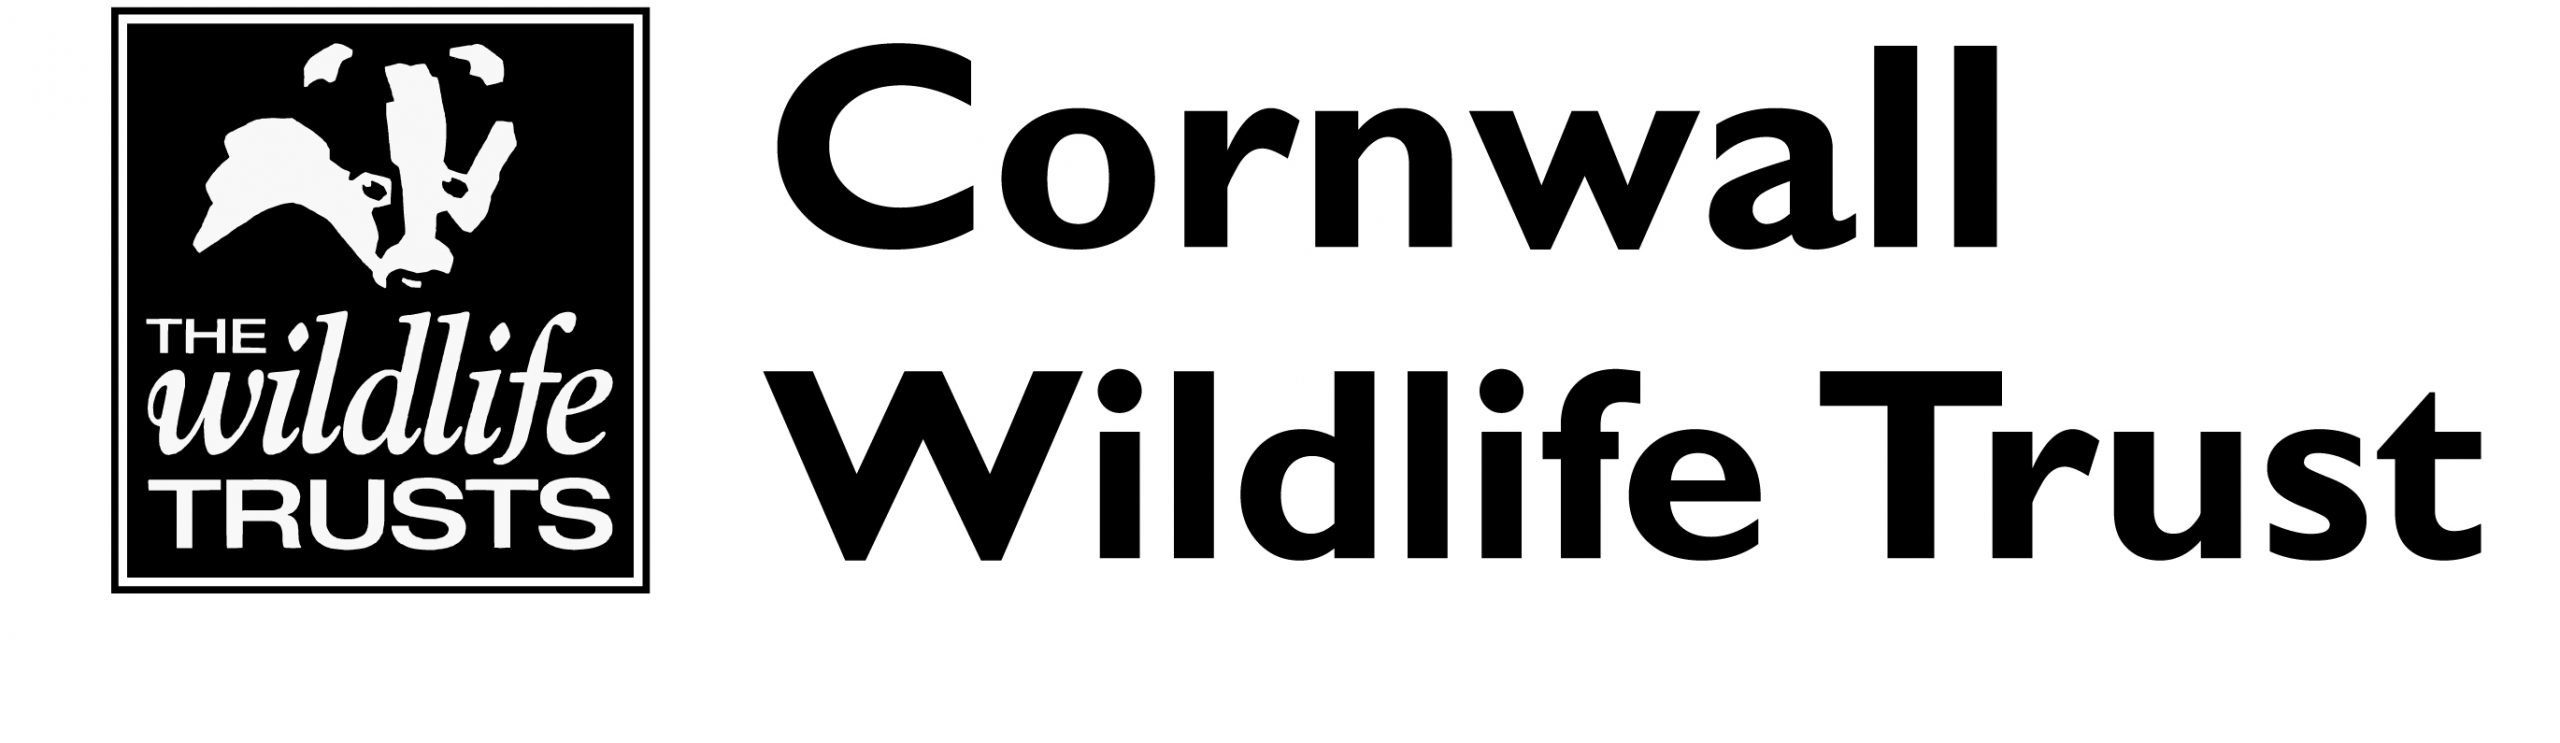 Cornwall-wildlife-trust-logo-apr-14-left